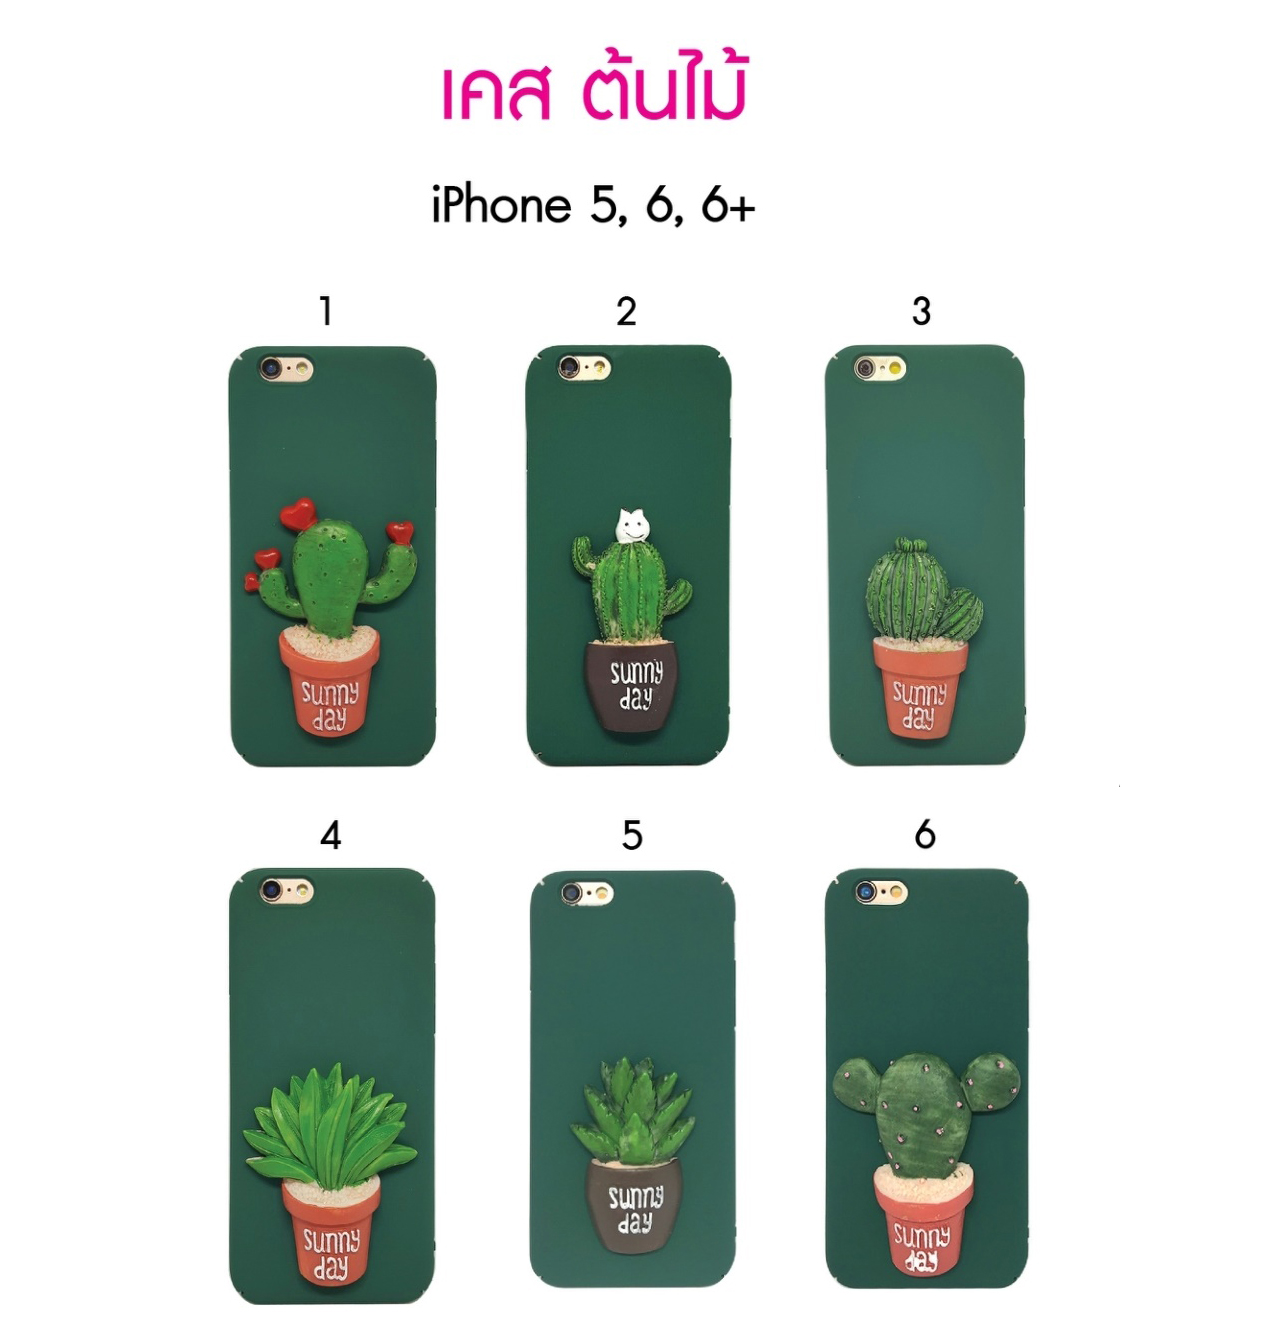 iPhone 7 - เคสแข็งปิดขอบ ลายกระบองเพชร (Cactus)